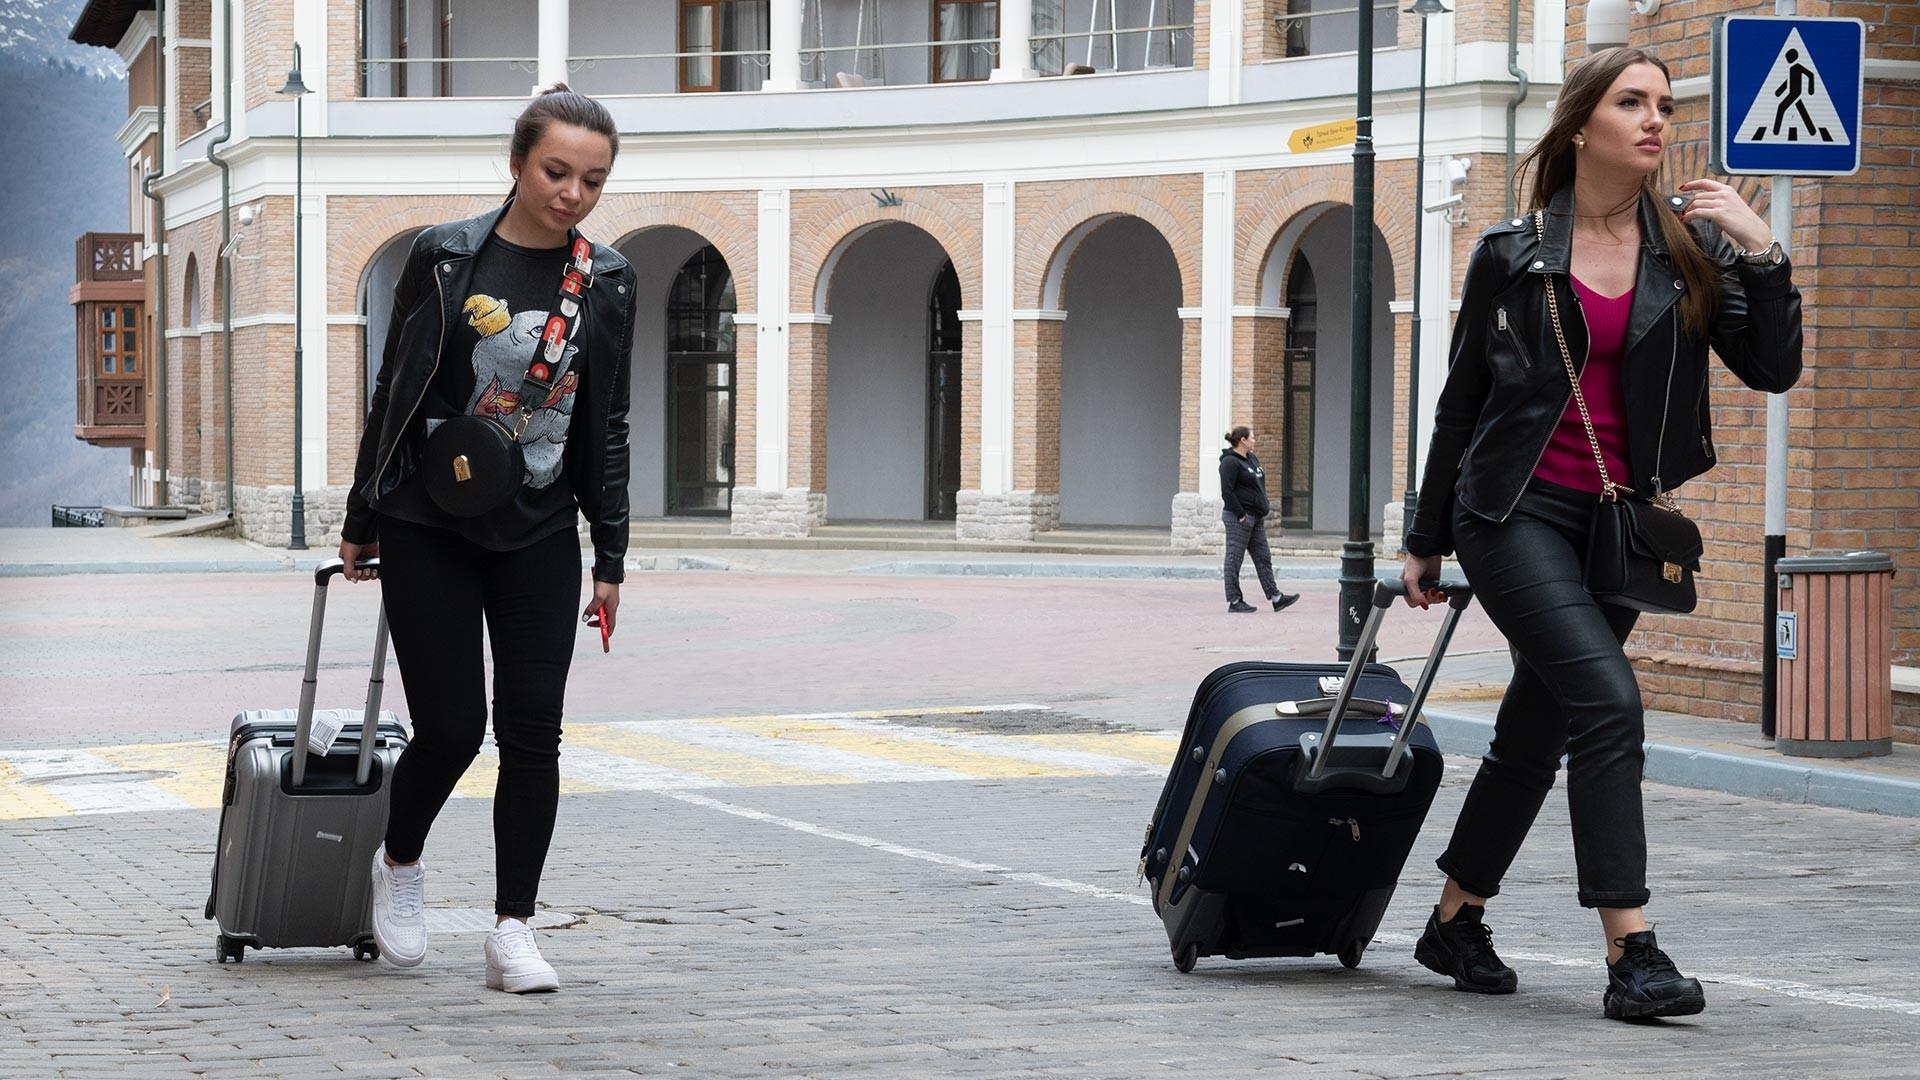 Turistas deixam Krásnaia Poliana.